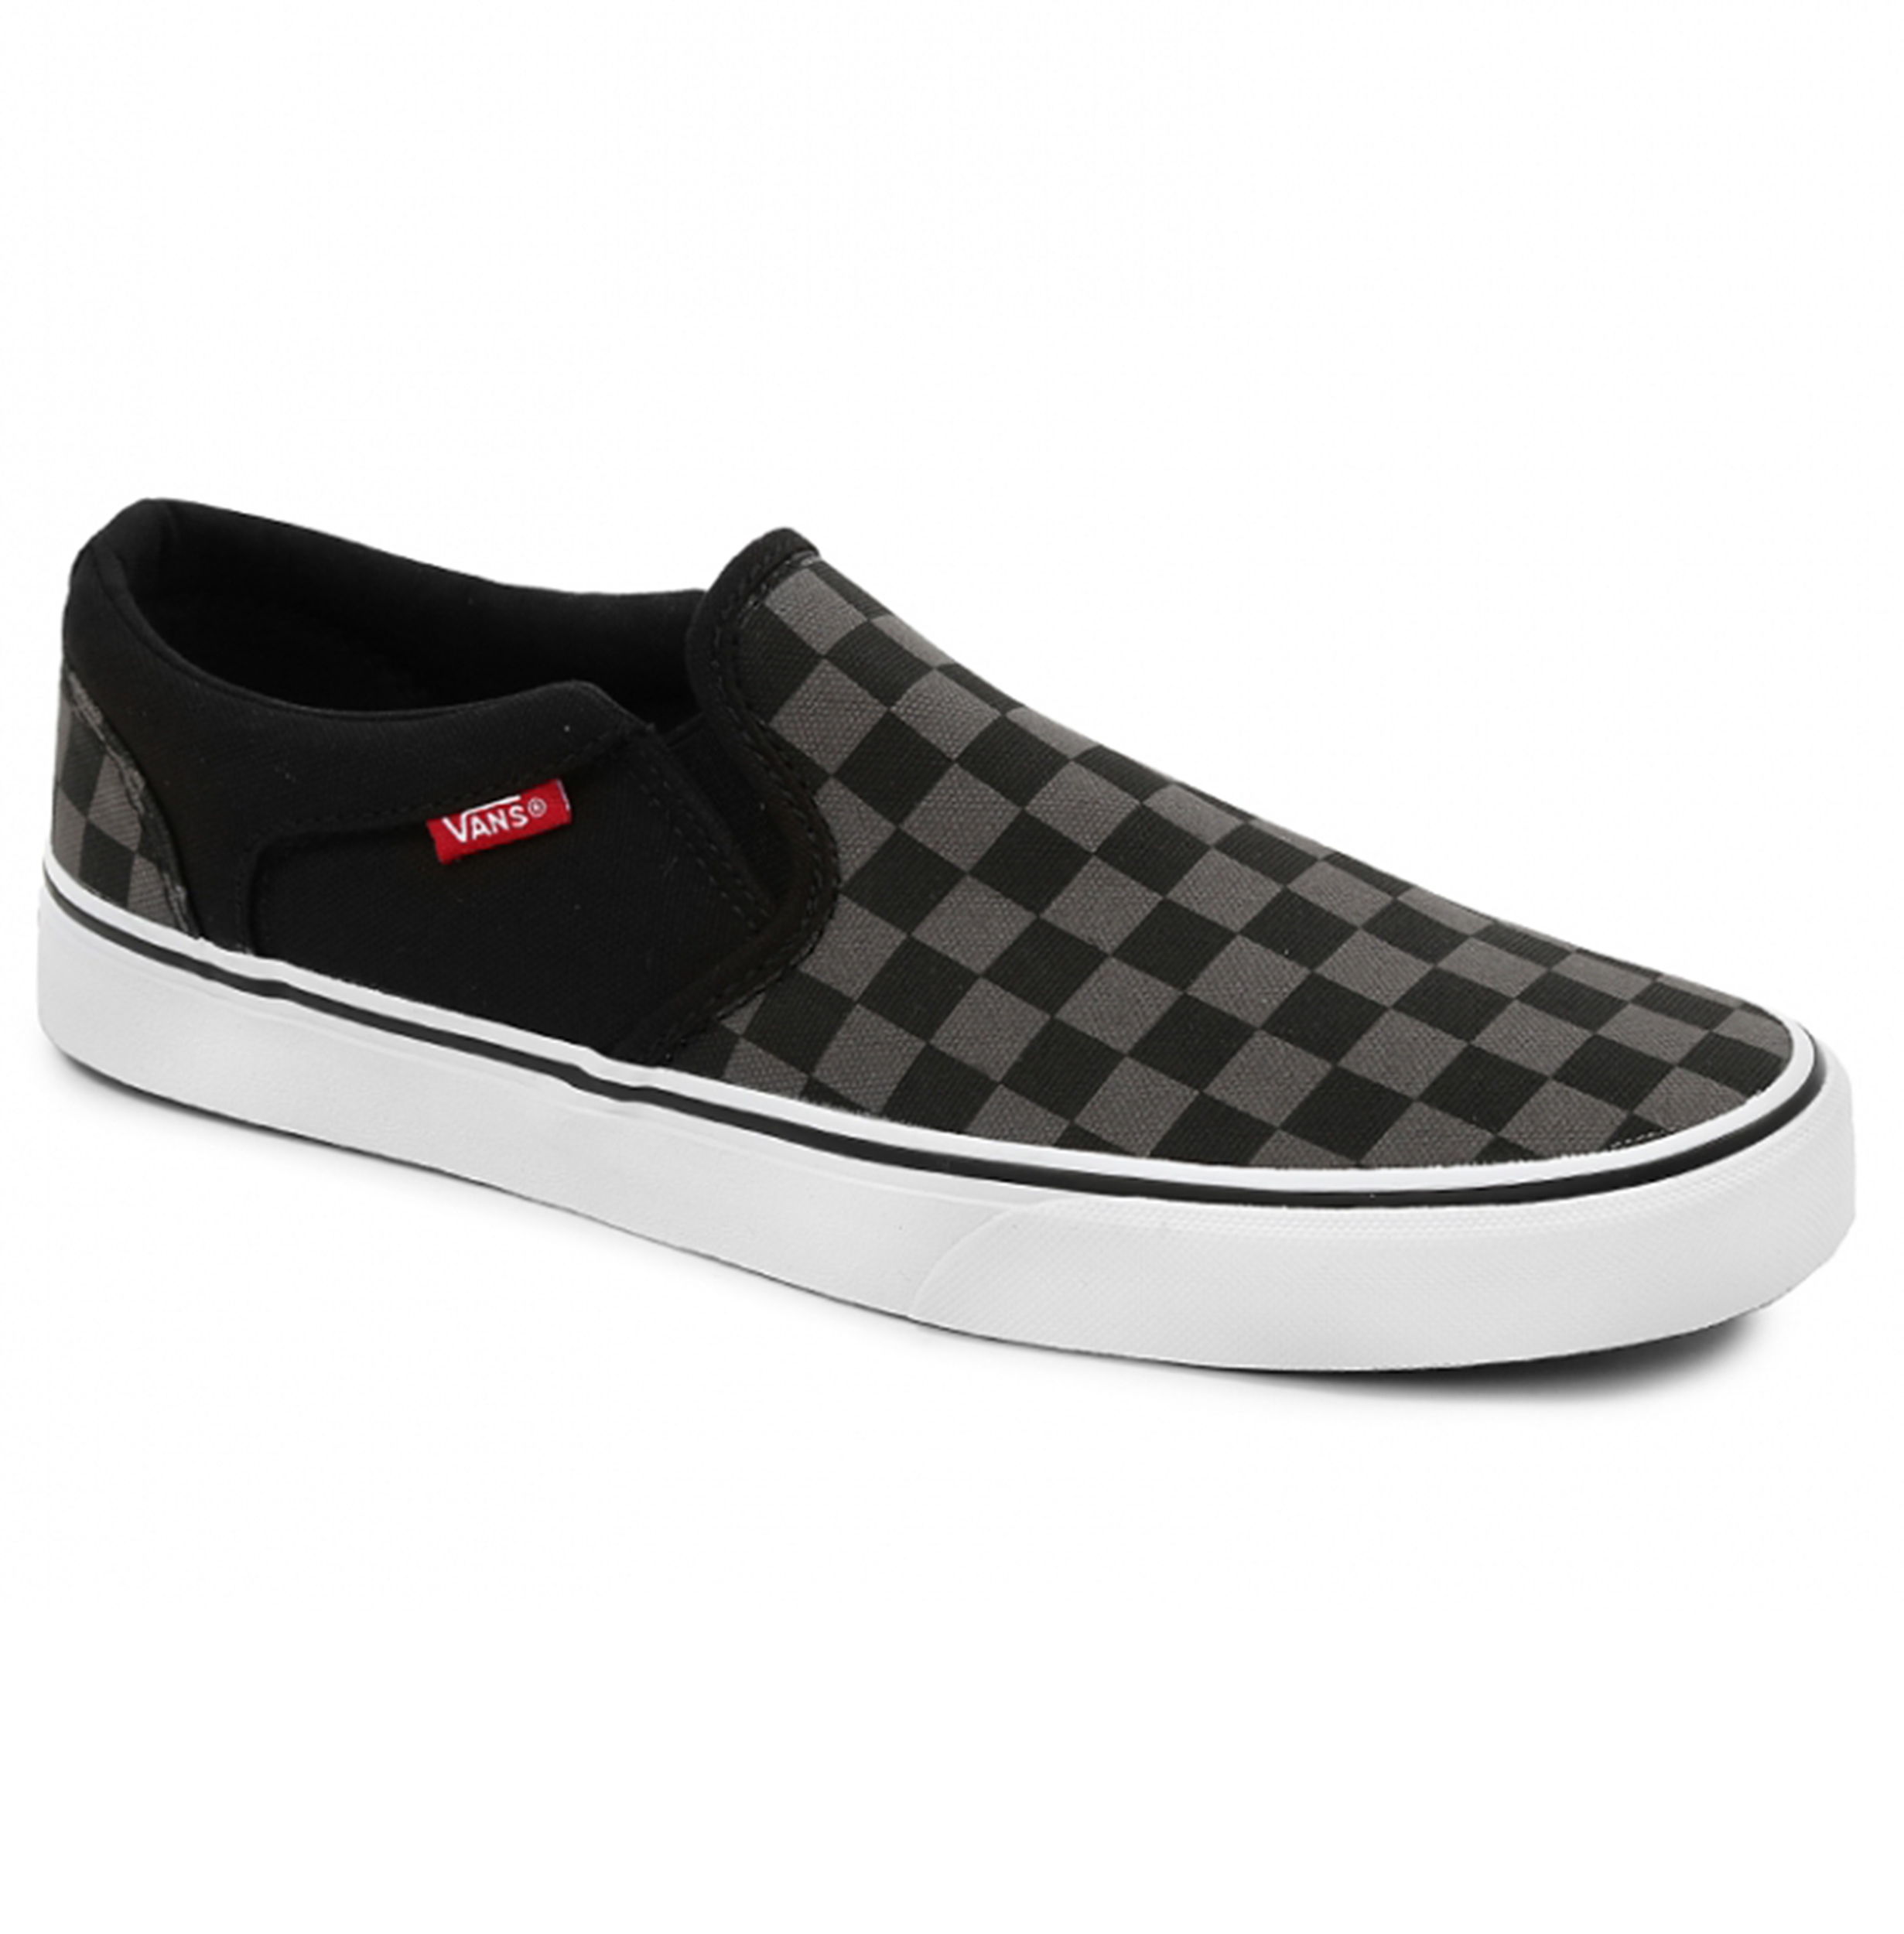 2e6ed1a6e7a19 VANS Asher Canvas Skater Trainers Checker Shoes Slip On Plimsolls ...